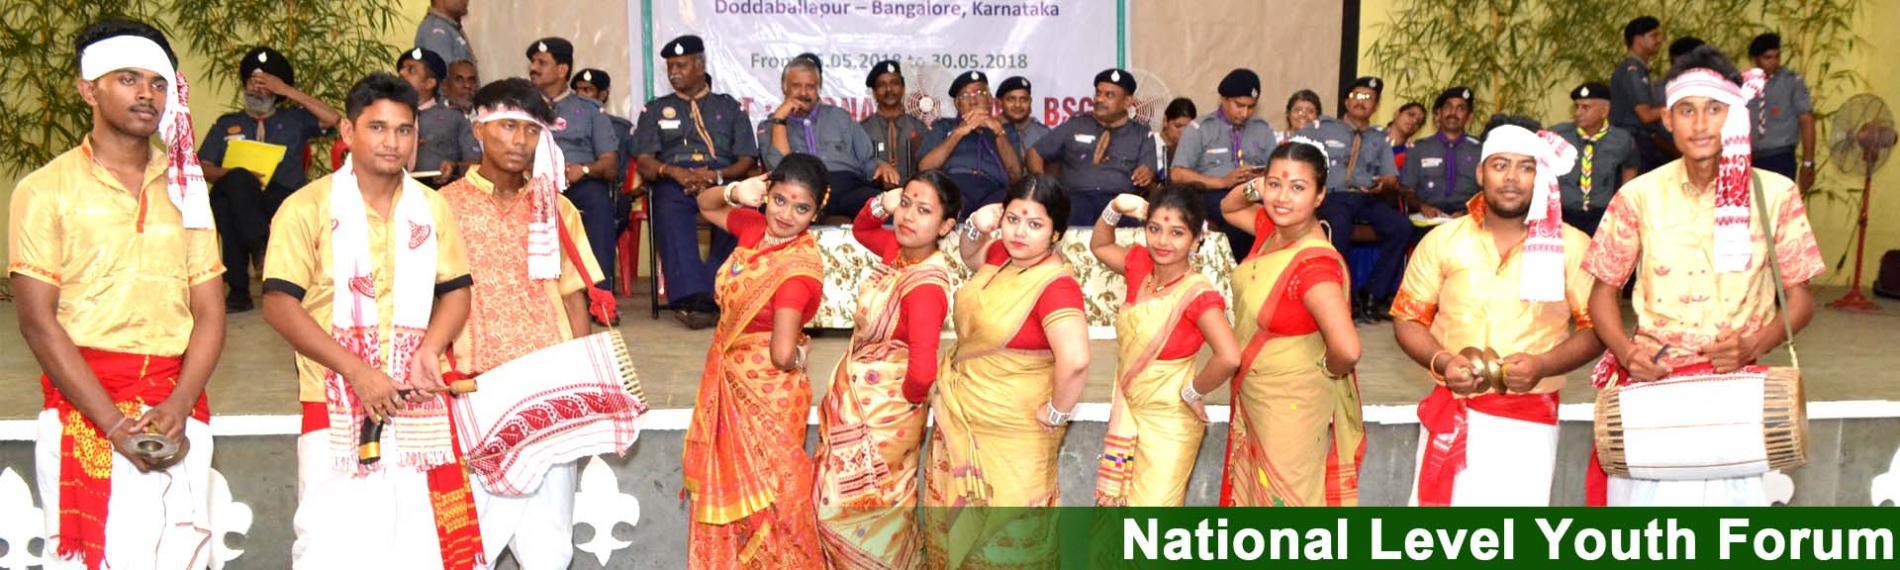 BSG India